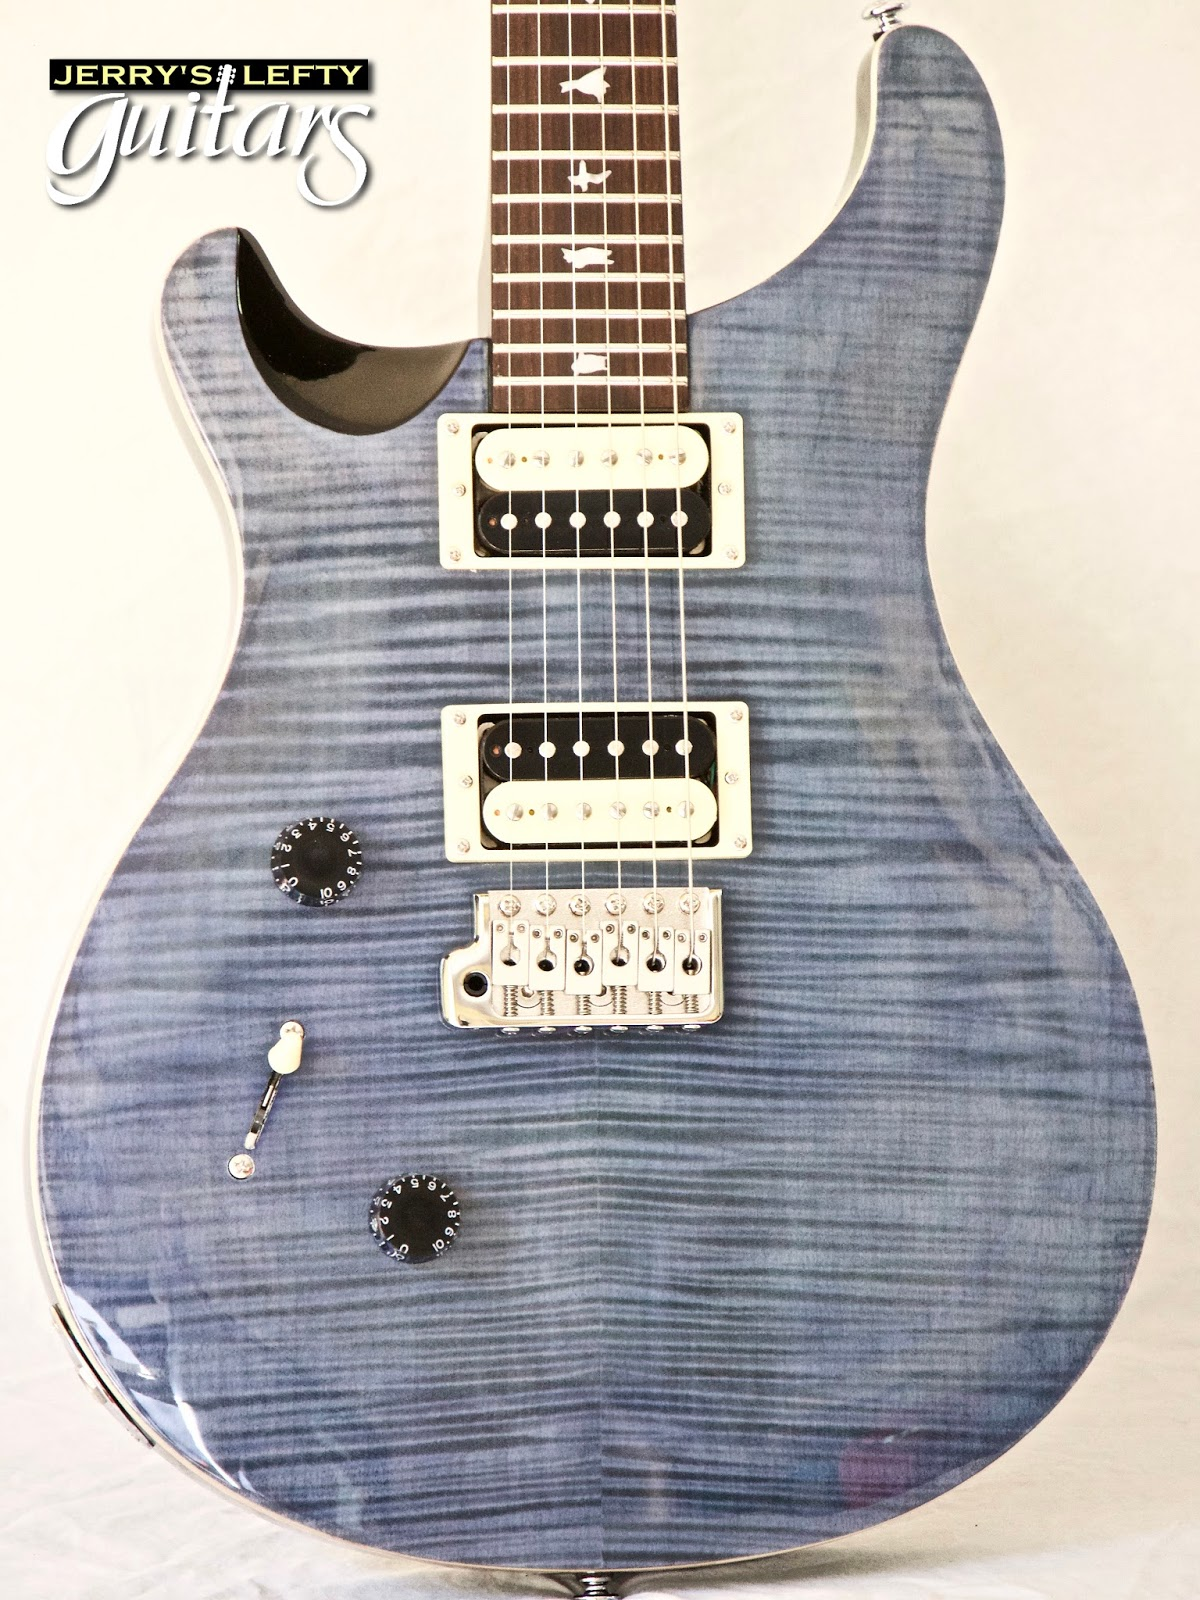 jerry 39 s lefty guitars newest guitar arrivals updated weekly prs se custom 24 whale blue 869. Black Bedroom Furniture Sets. Home Design Ideas